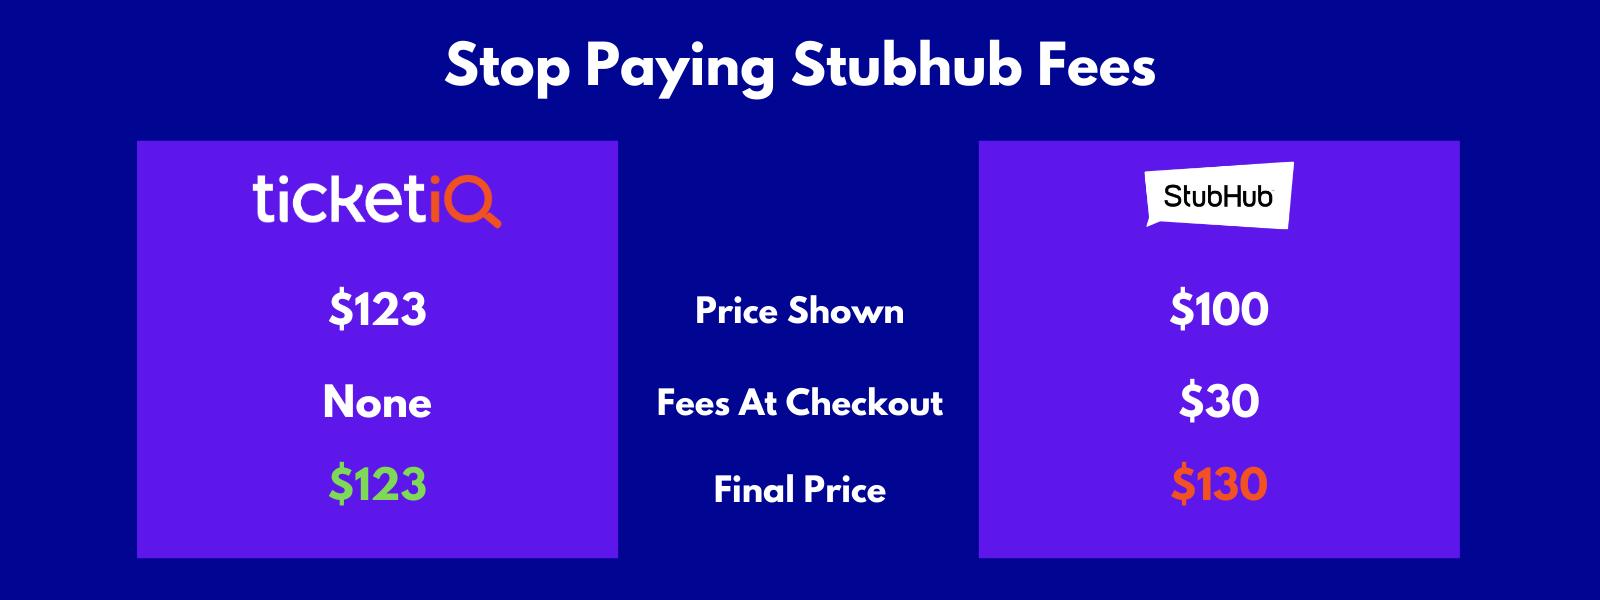 Price Shown 1